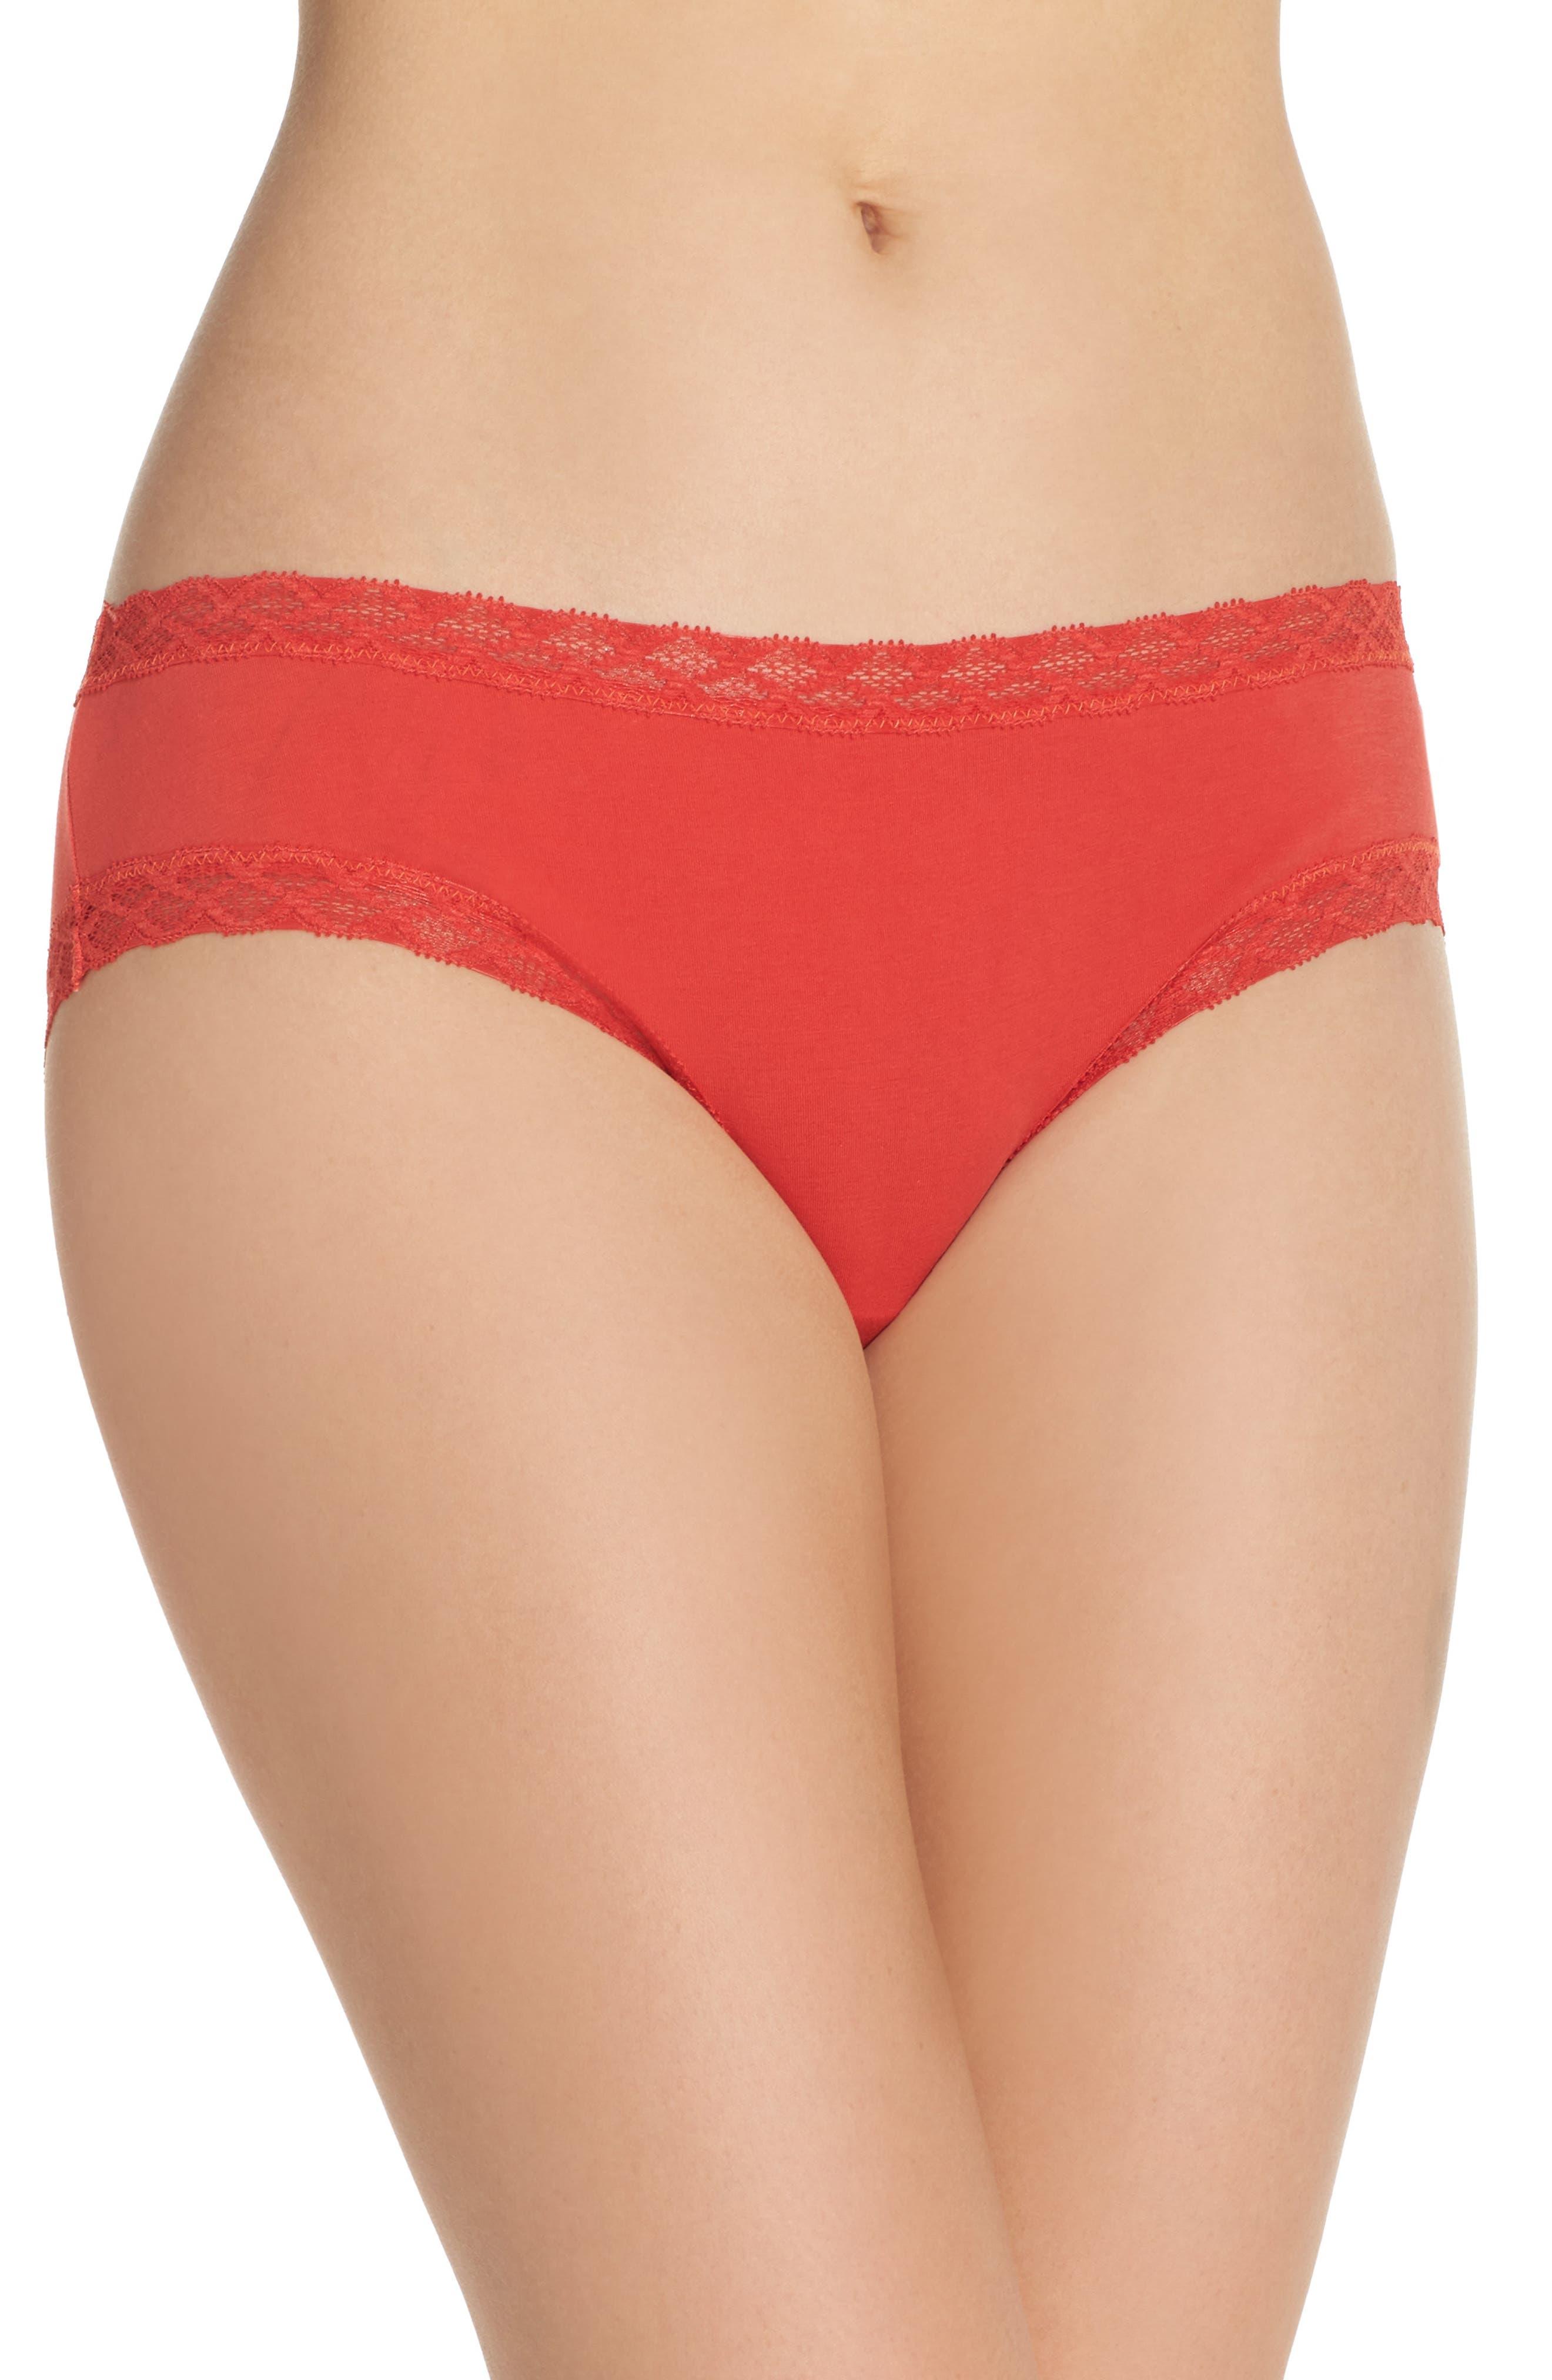 Alternate Image 1 Selected - Natori Bliss Cotton Girl Briefs (3 for $45)